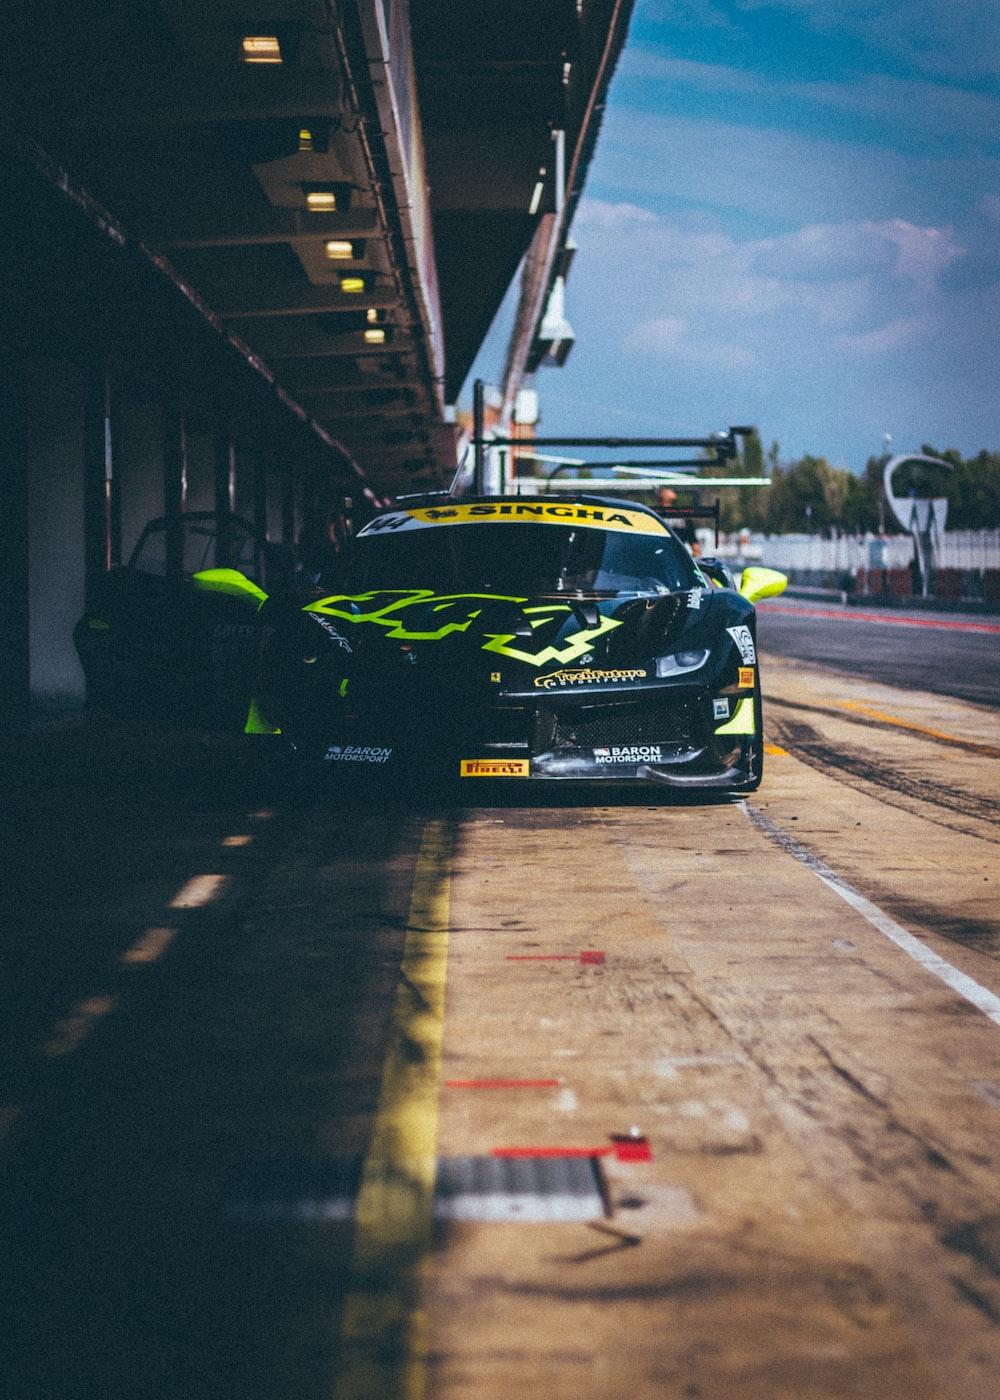 black and yellow vehicle